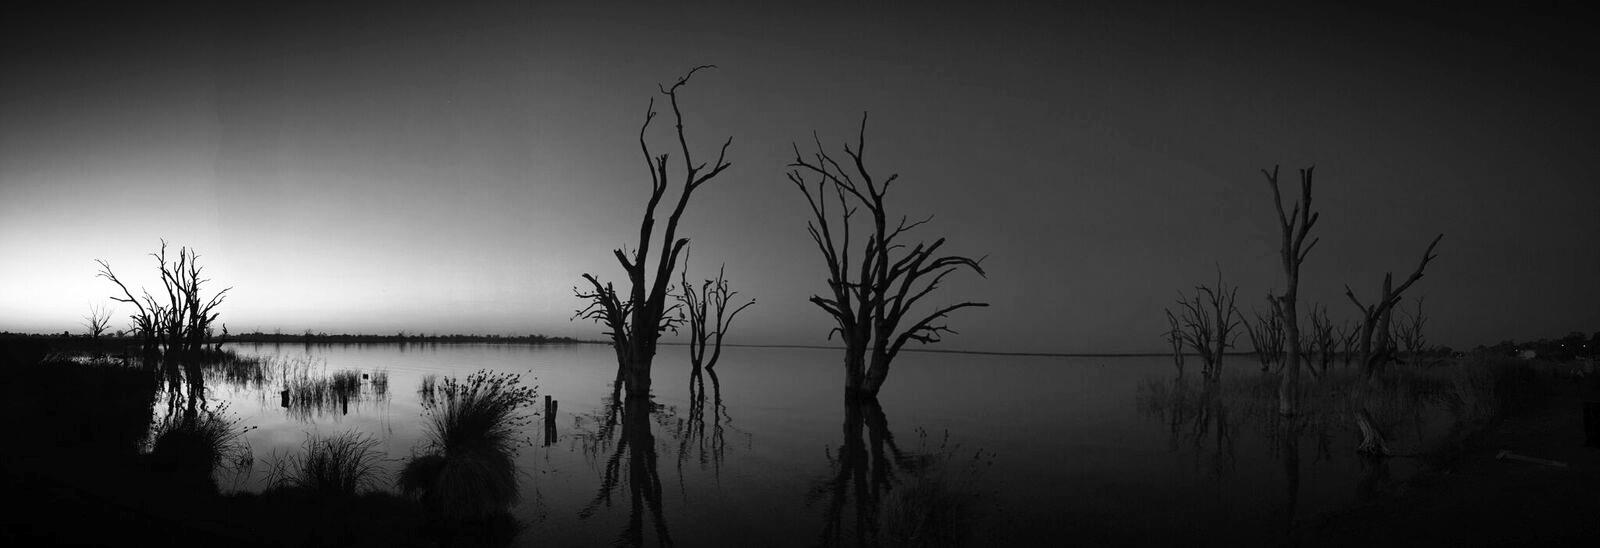 Still photography -